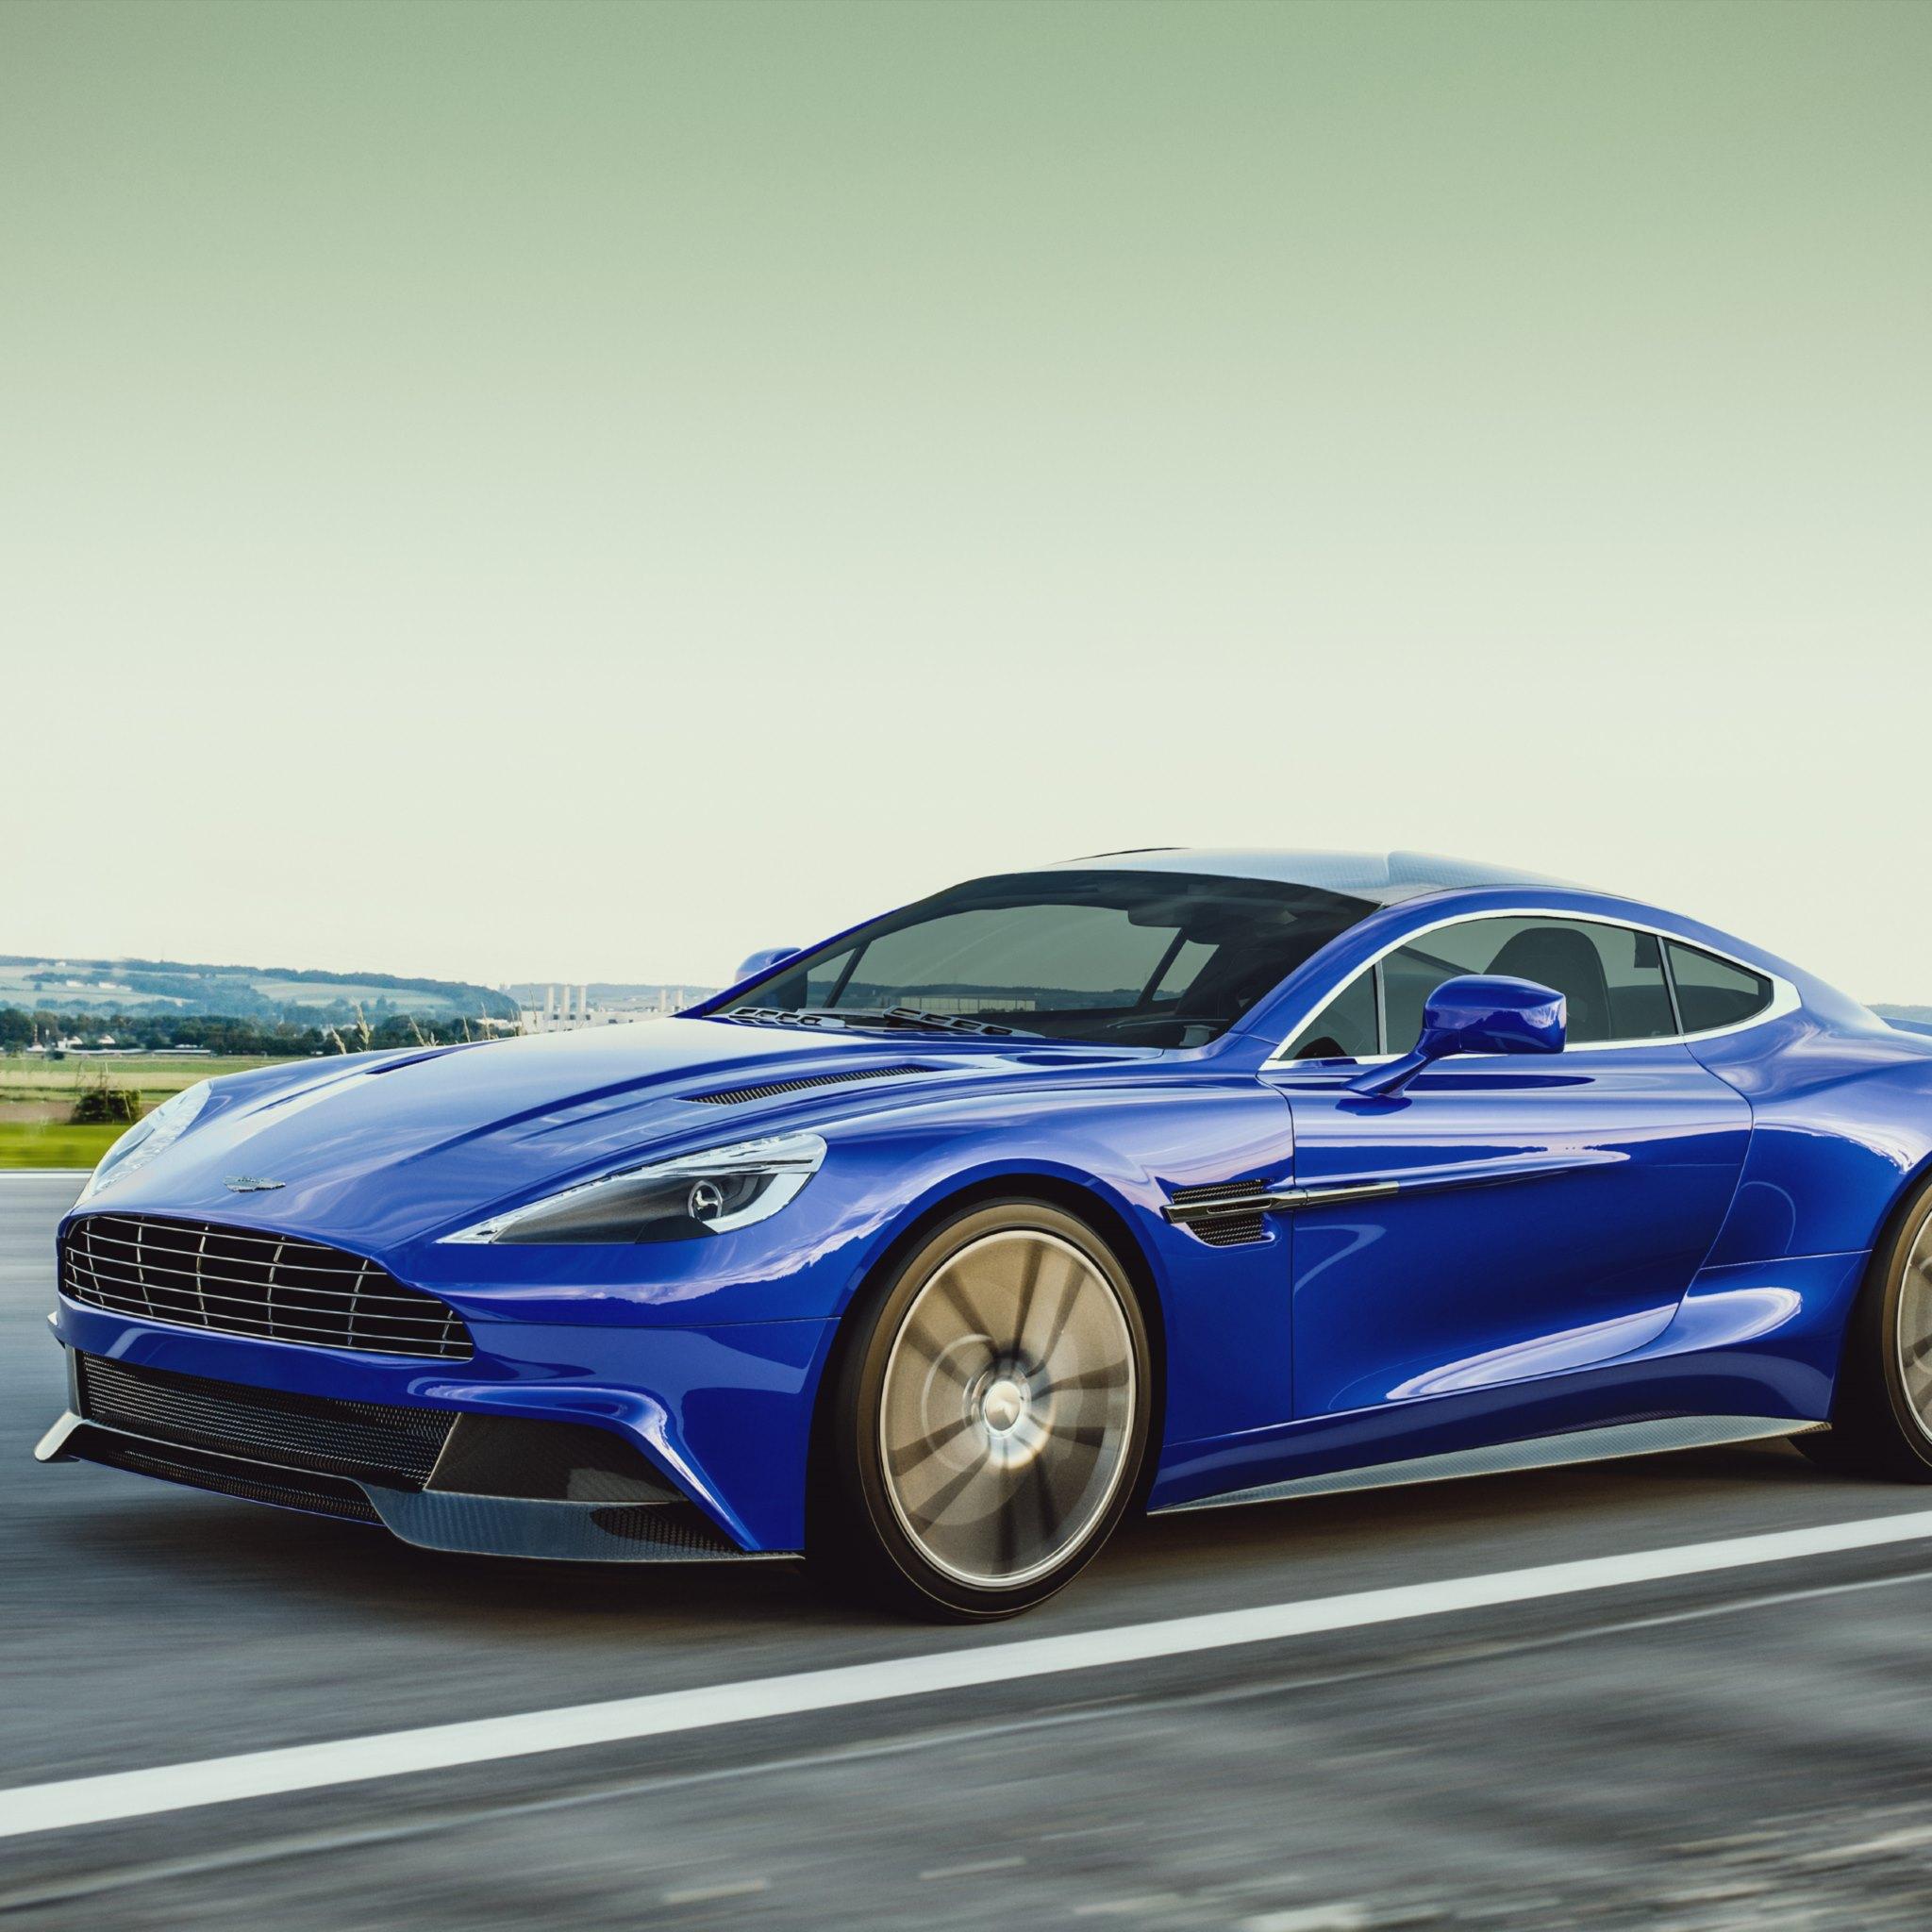 2016 Aston Martin Vanquish Camshaft: Aston Martin Vanquish Blue